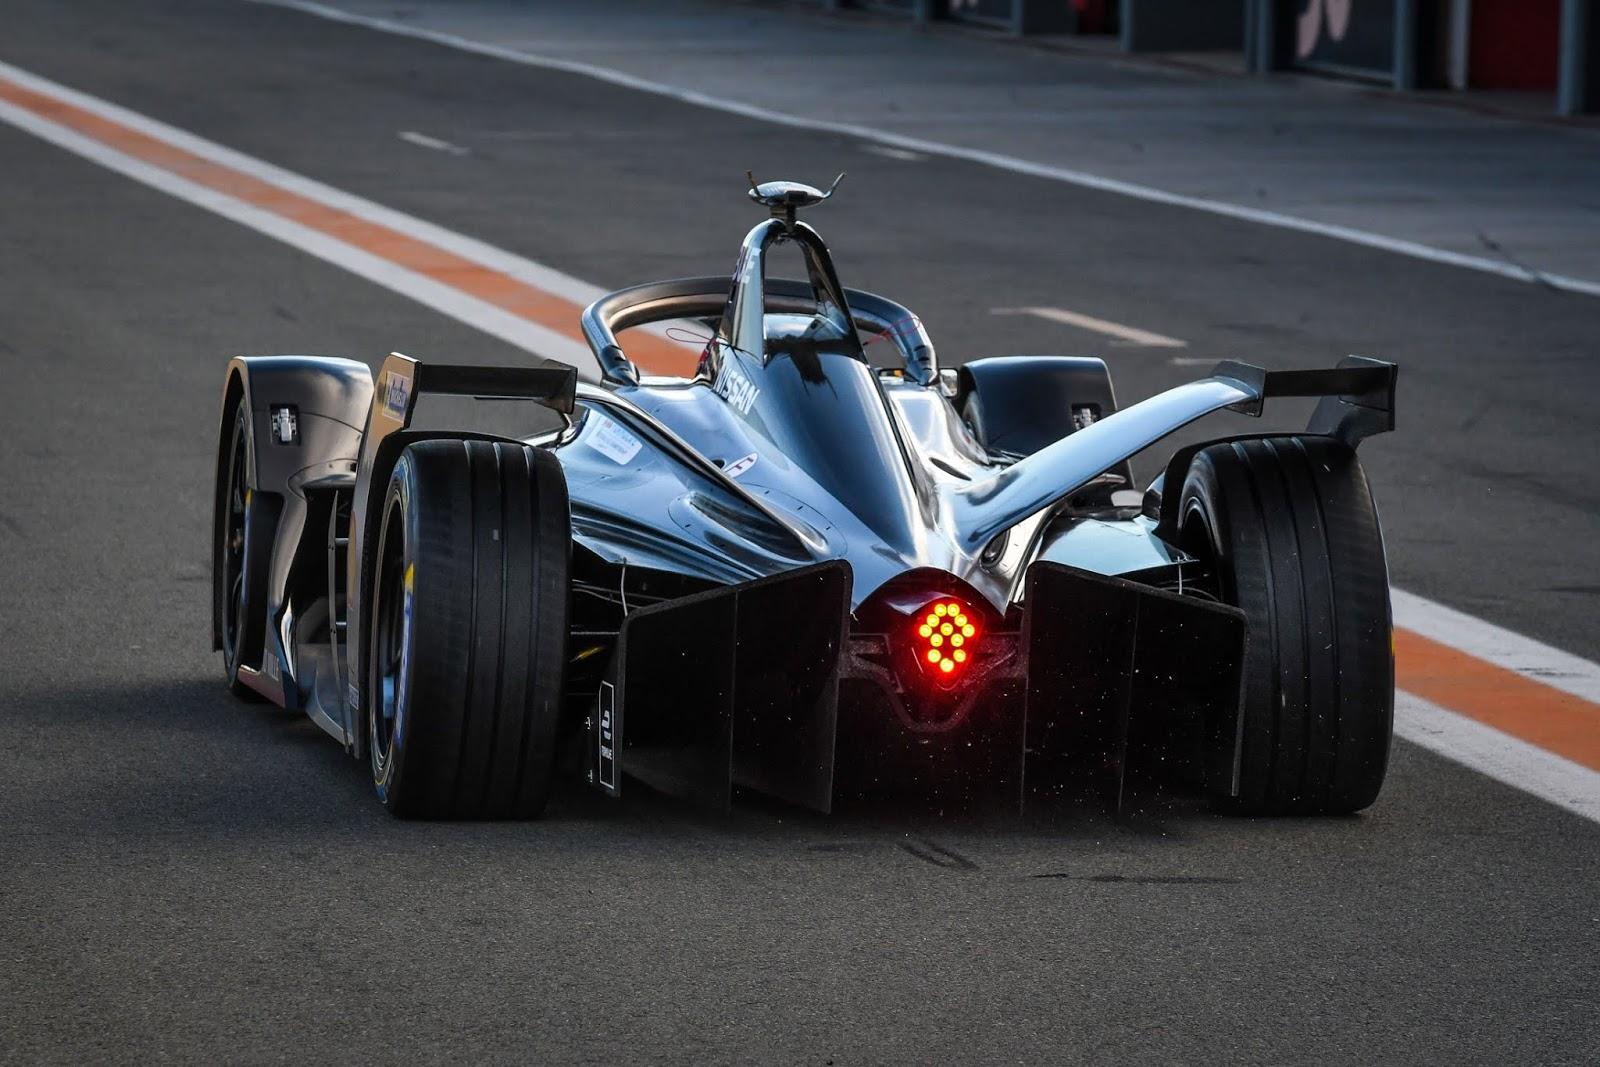 Nissan Formula E Valencia Test 252822529 Η ανάβαση στις Ελβετικές Άλπεις με μια φόρμουλα θα σε πορώσει Formula, Hillclimb, Reynard 97D, Swiss Course de cote Les Rangier, video, videos